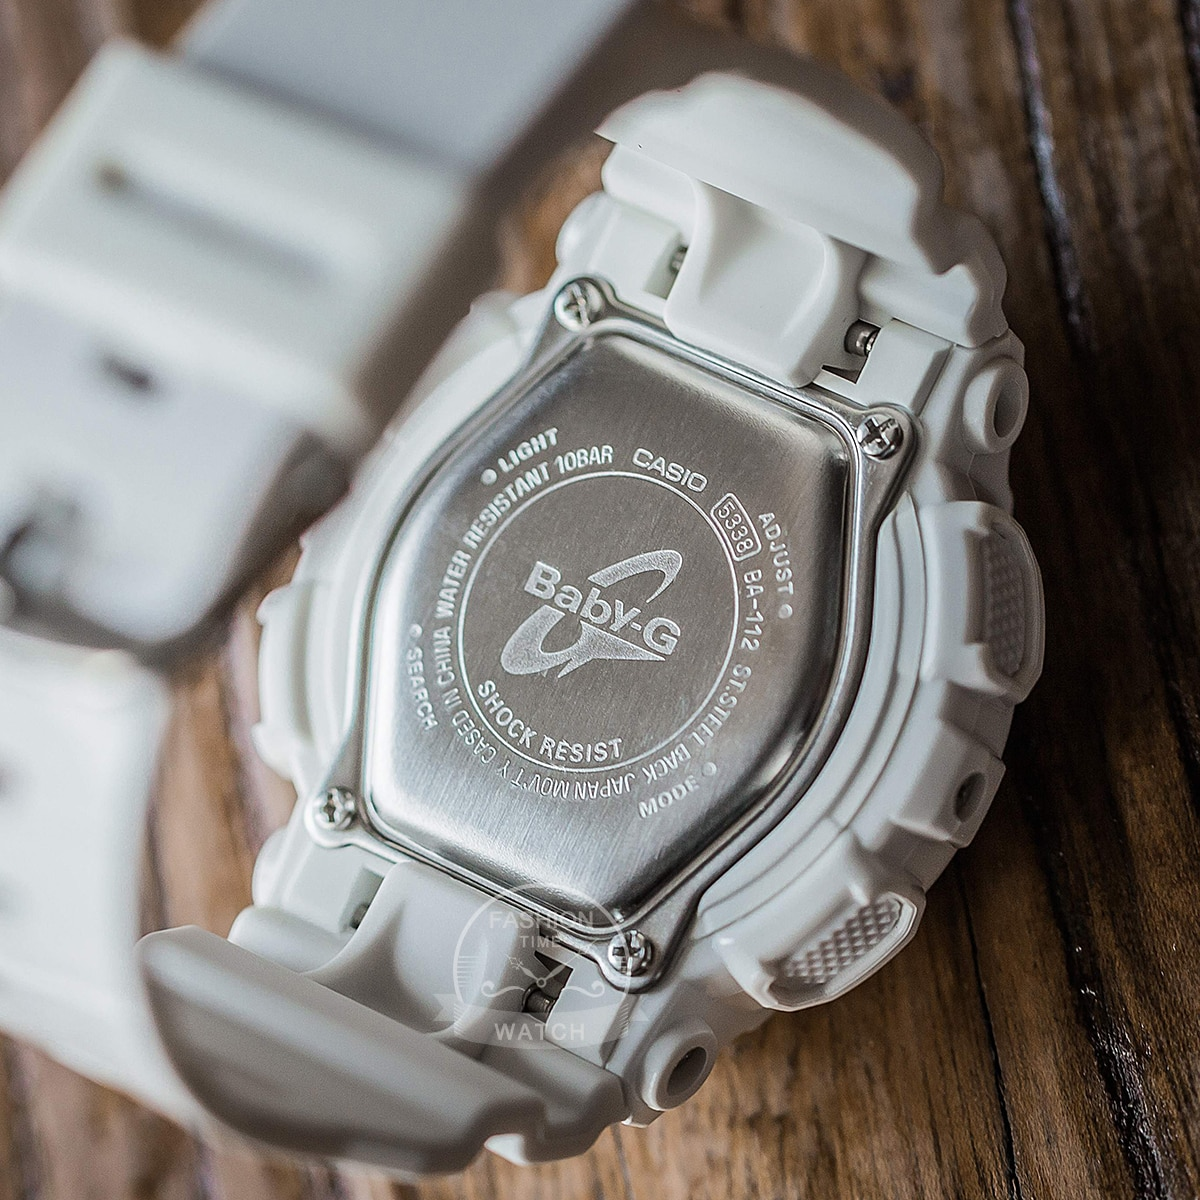 Casio watch g shock women watches uxury set display ladies watch 100m Waterproof LED digital Quartz watch reloj mujer masculino enlarge